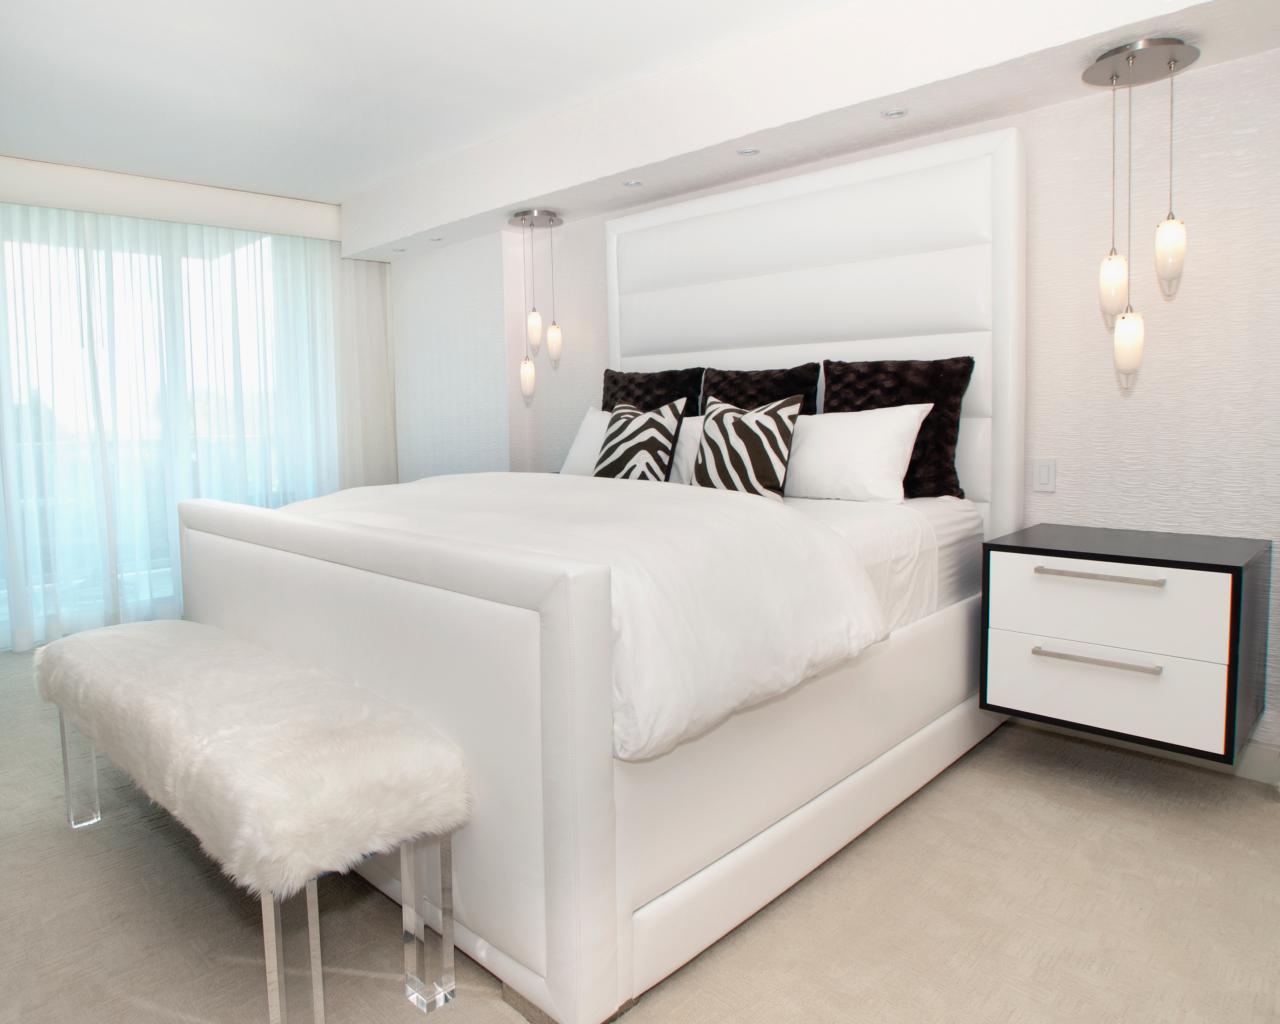 Alena-Capra_All-White-Bedroom-bed